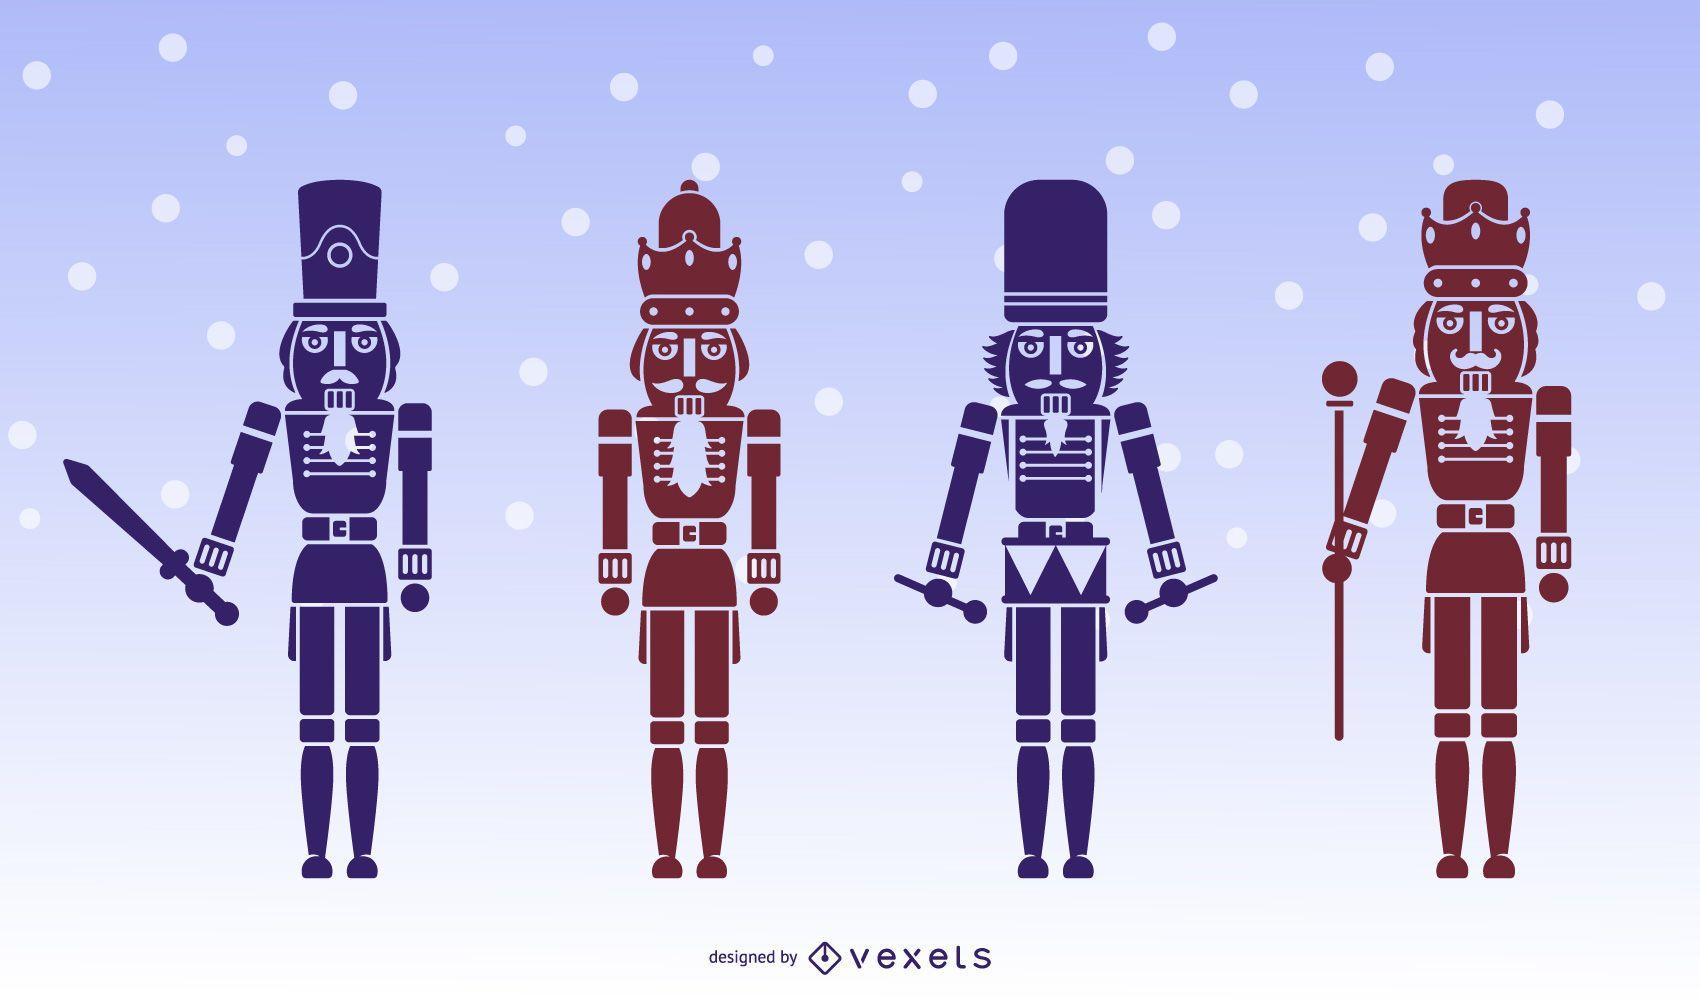 Conjunto de silueta de personaje de cascanueces